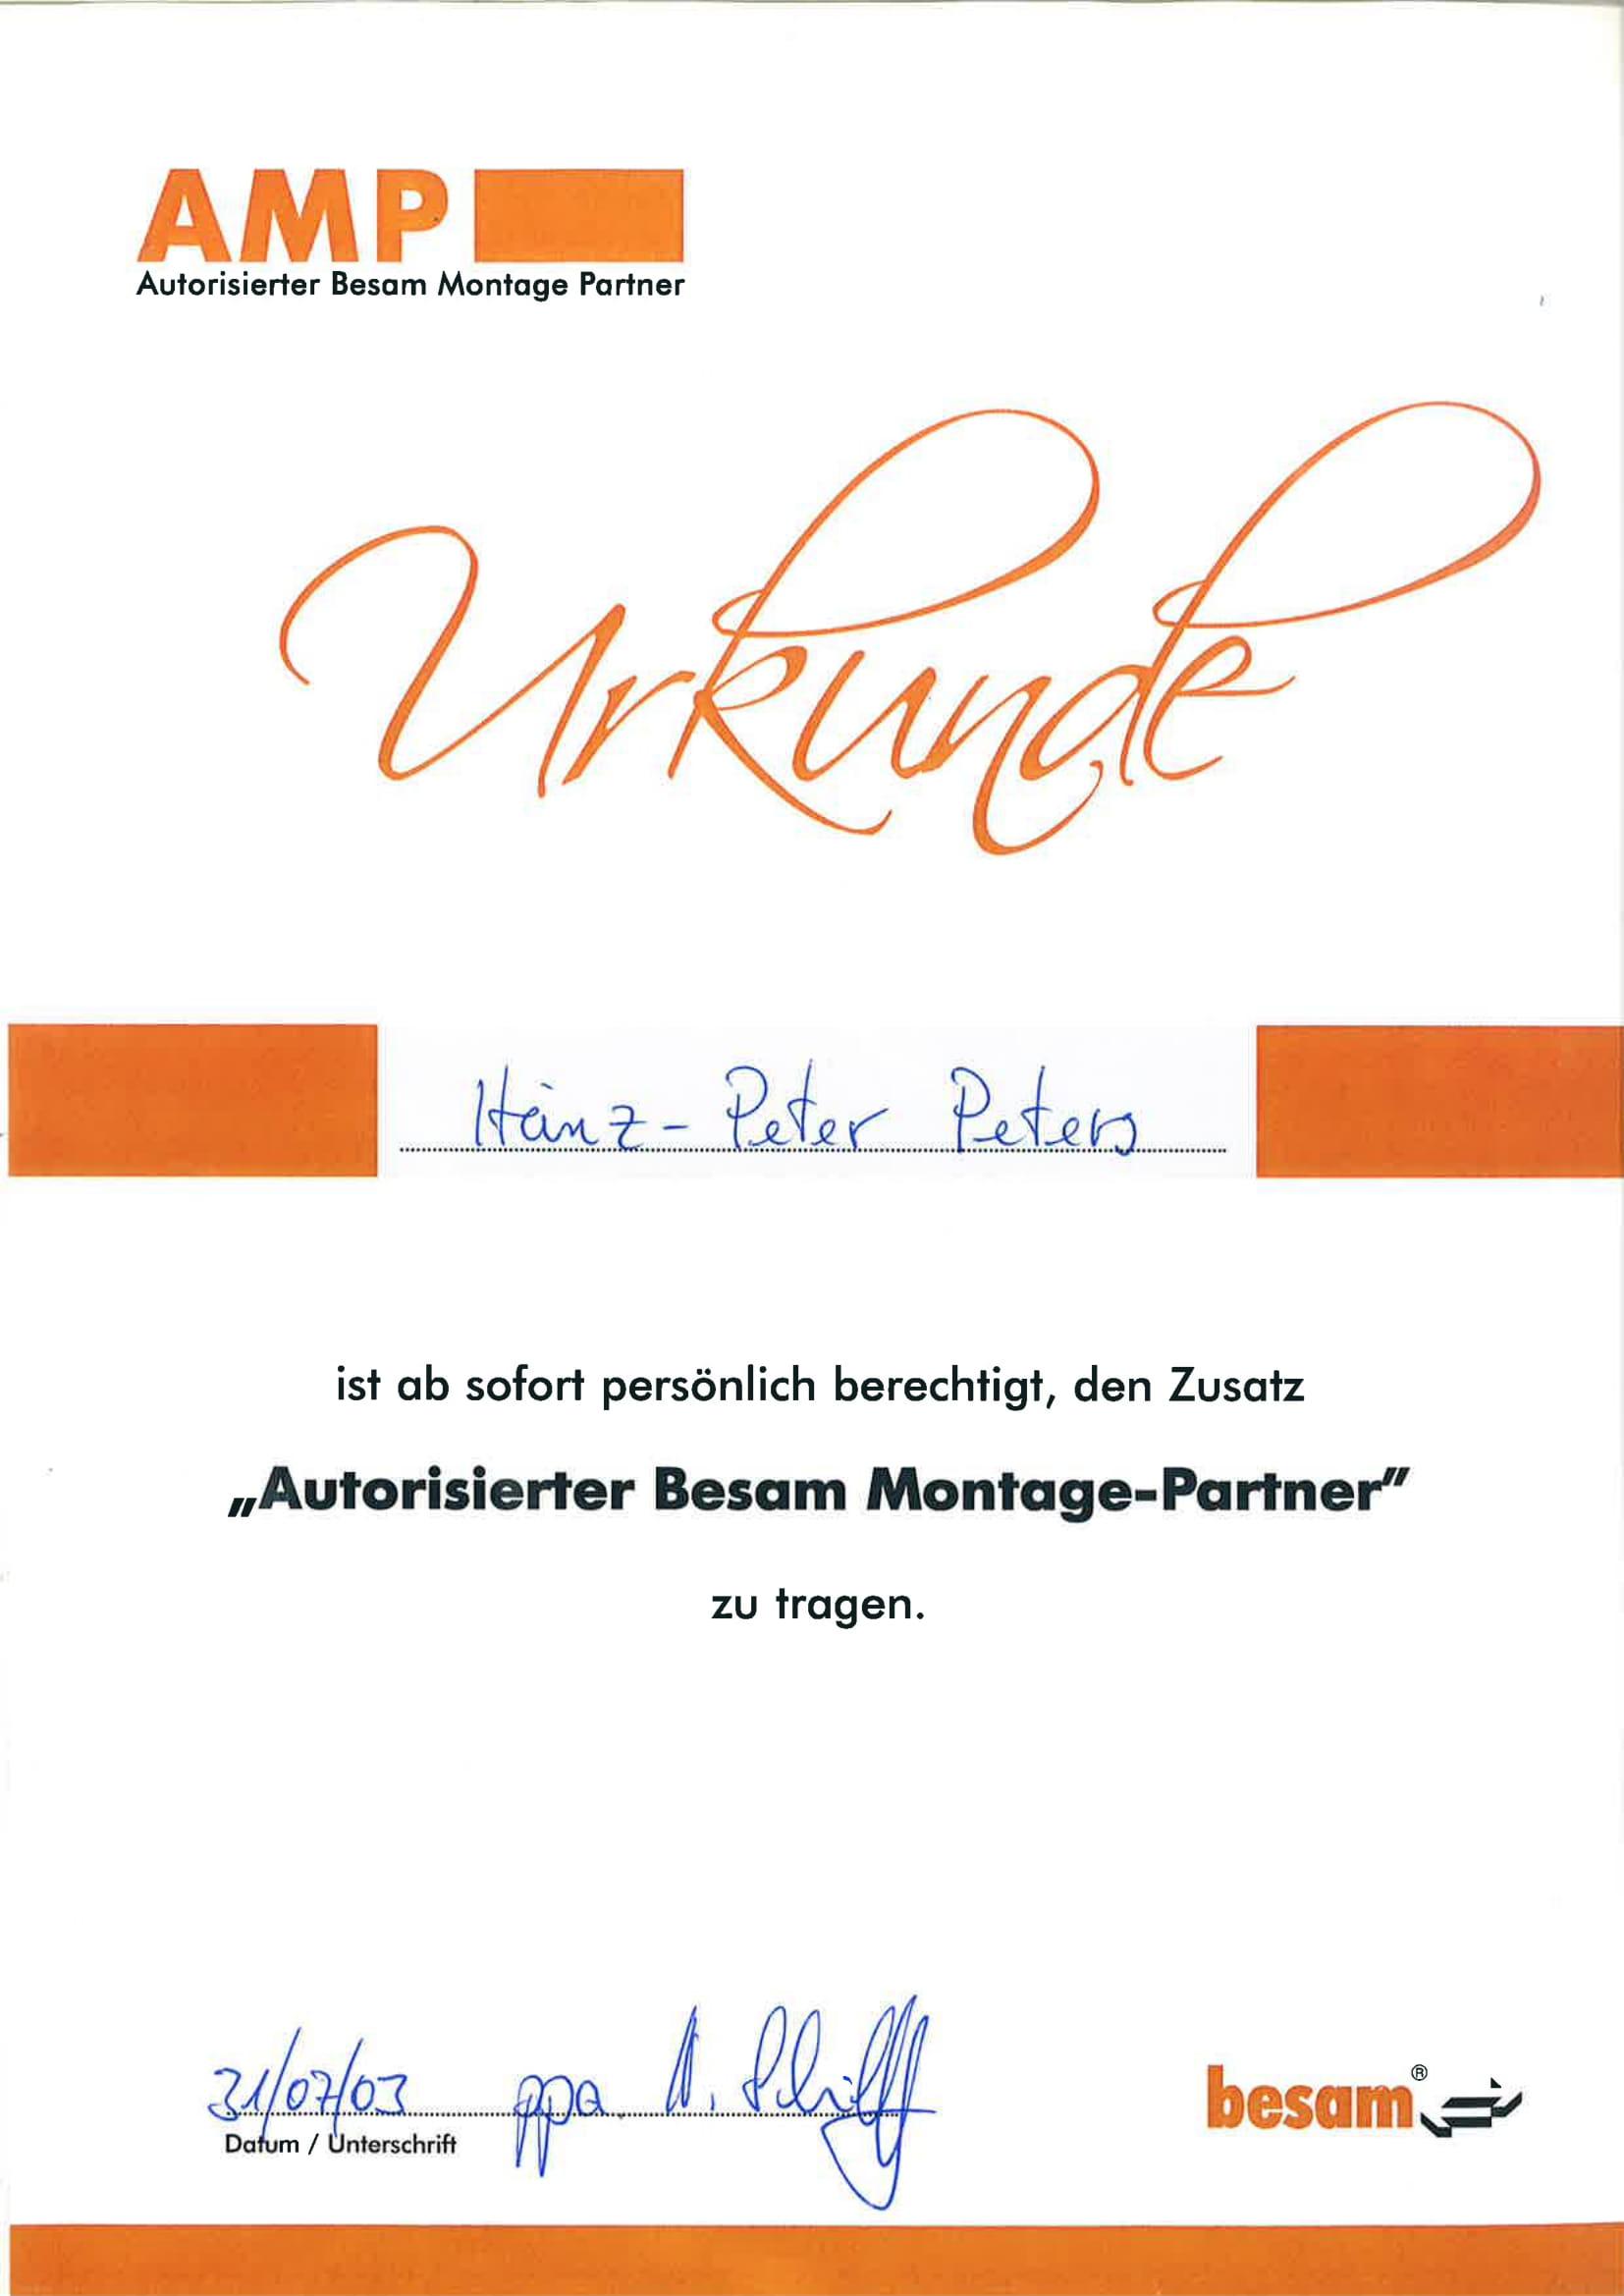 Urkunde Autorisierter Besam Montage-Partner